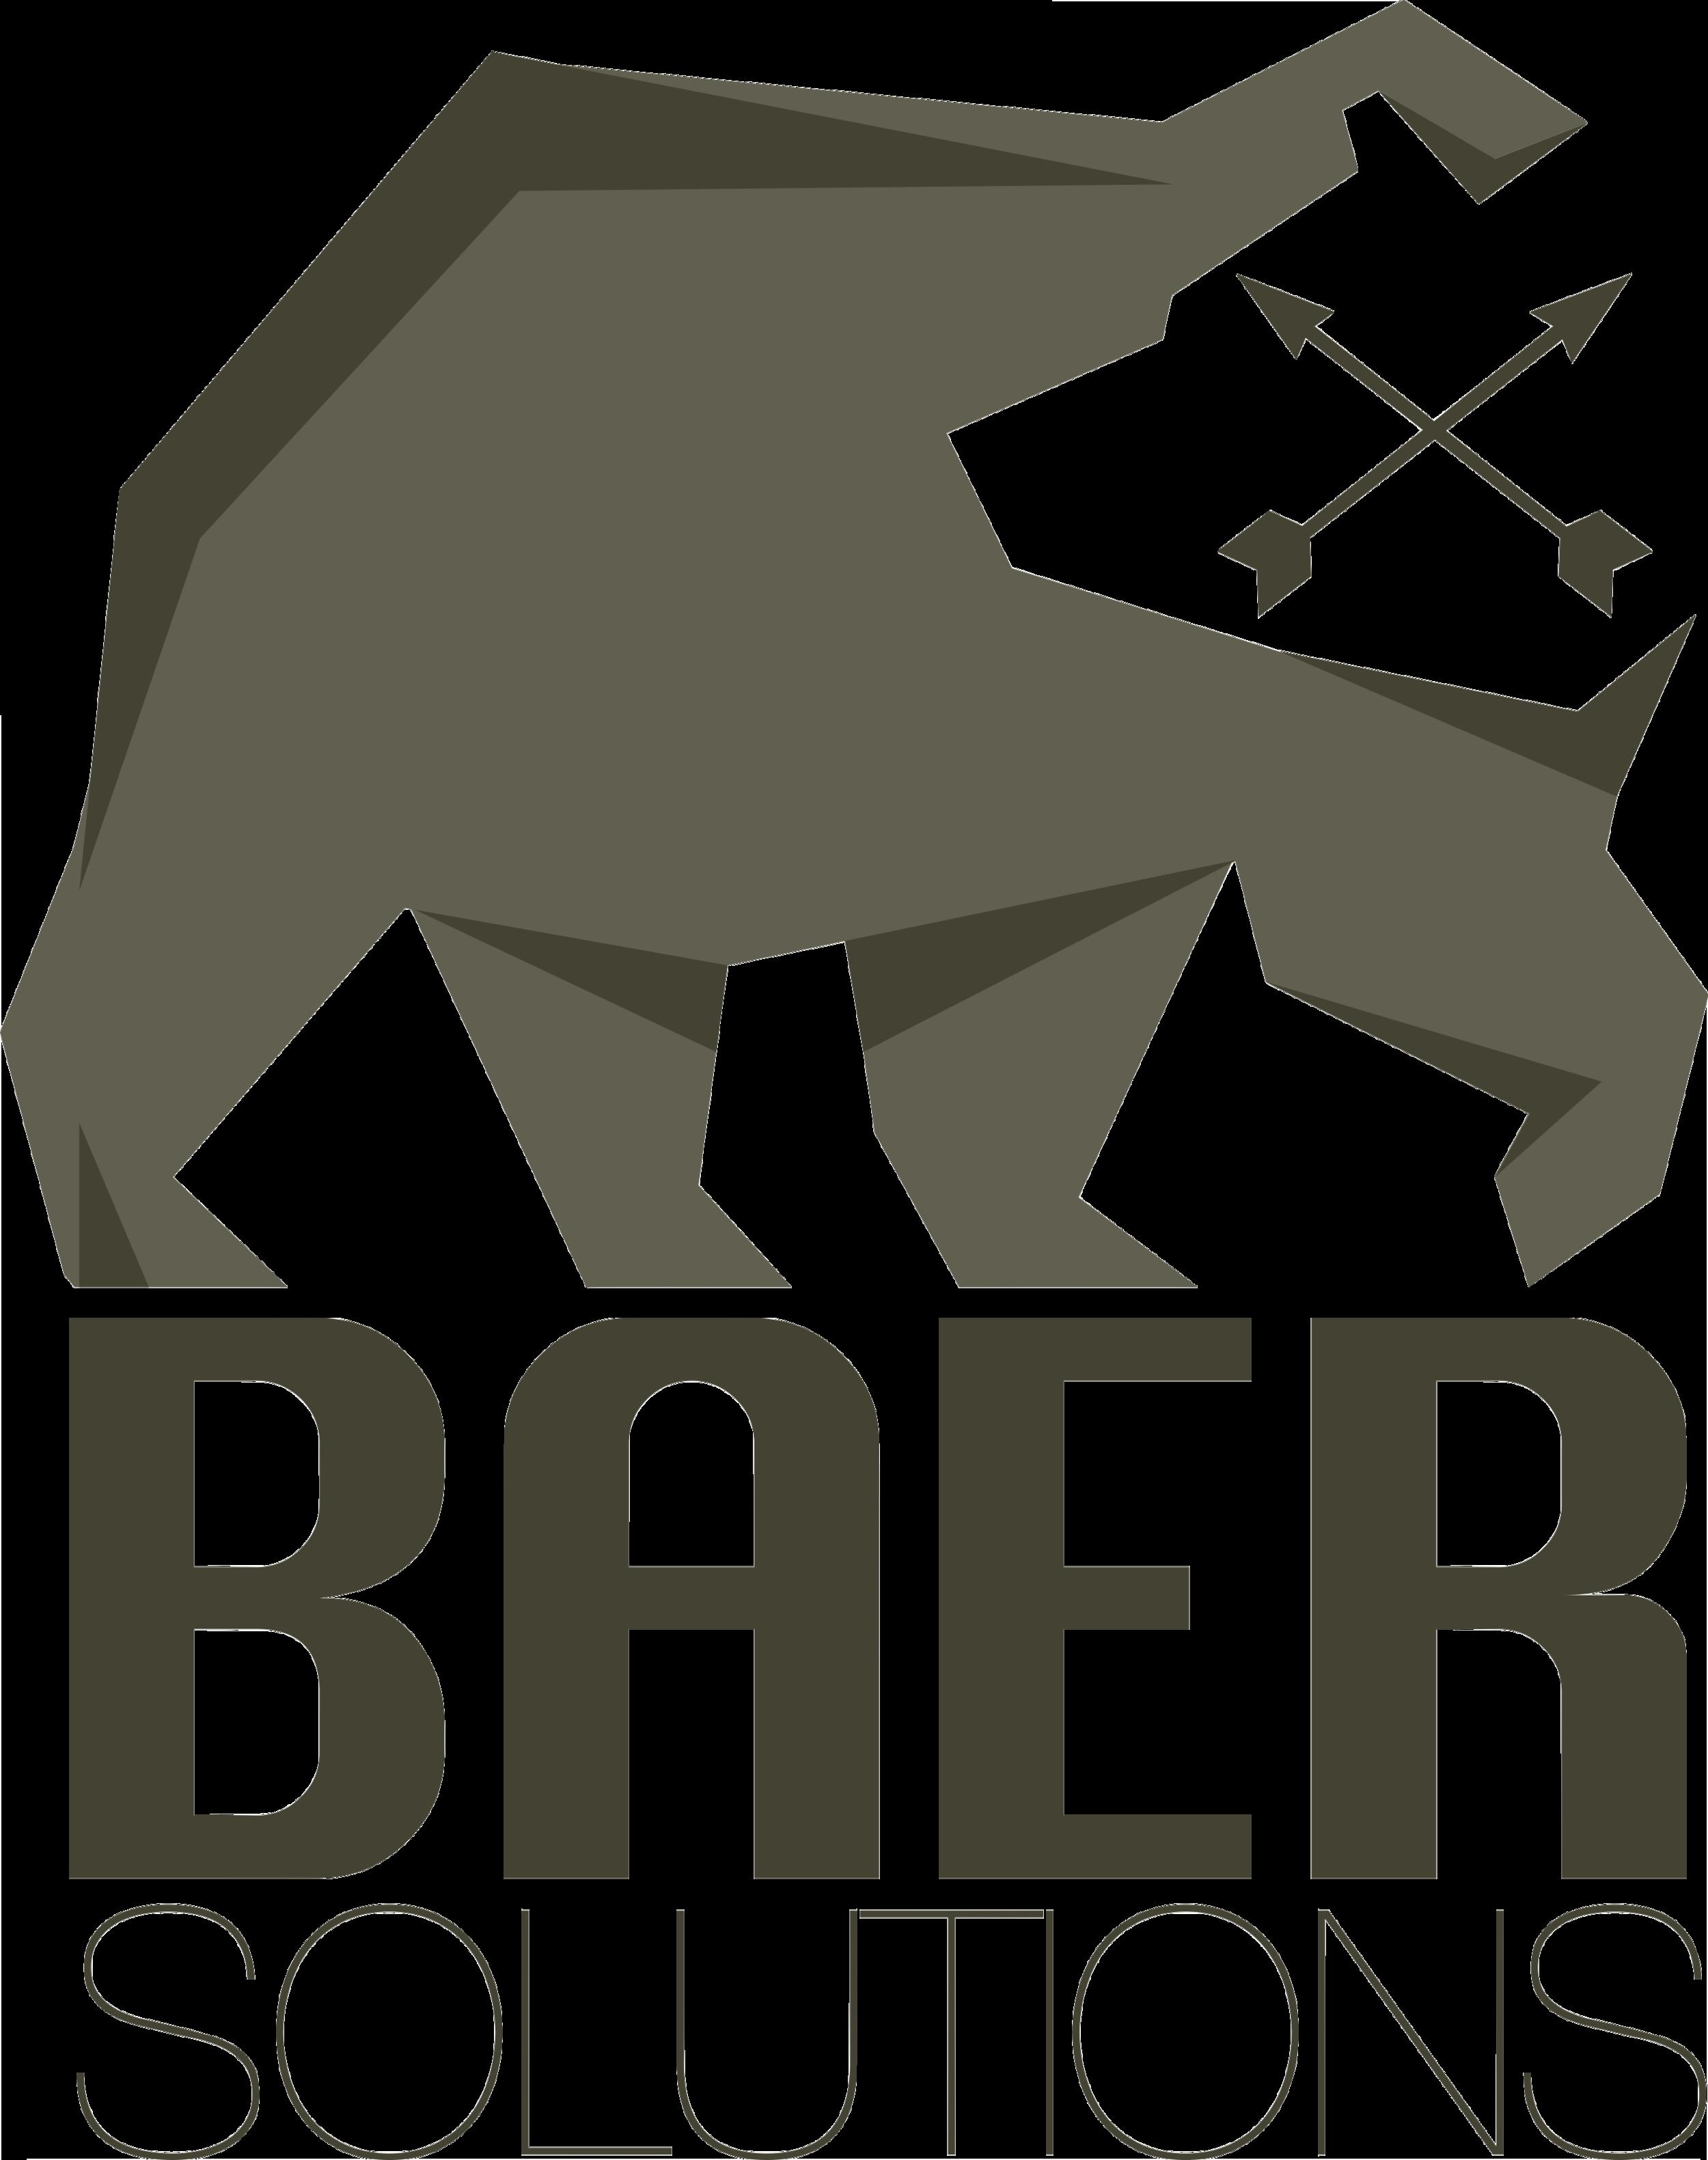 baer_main_logo.png